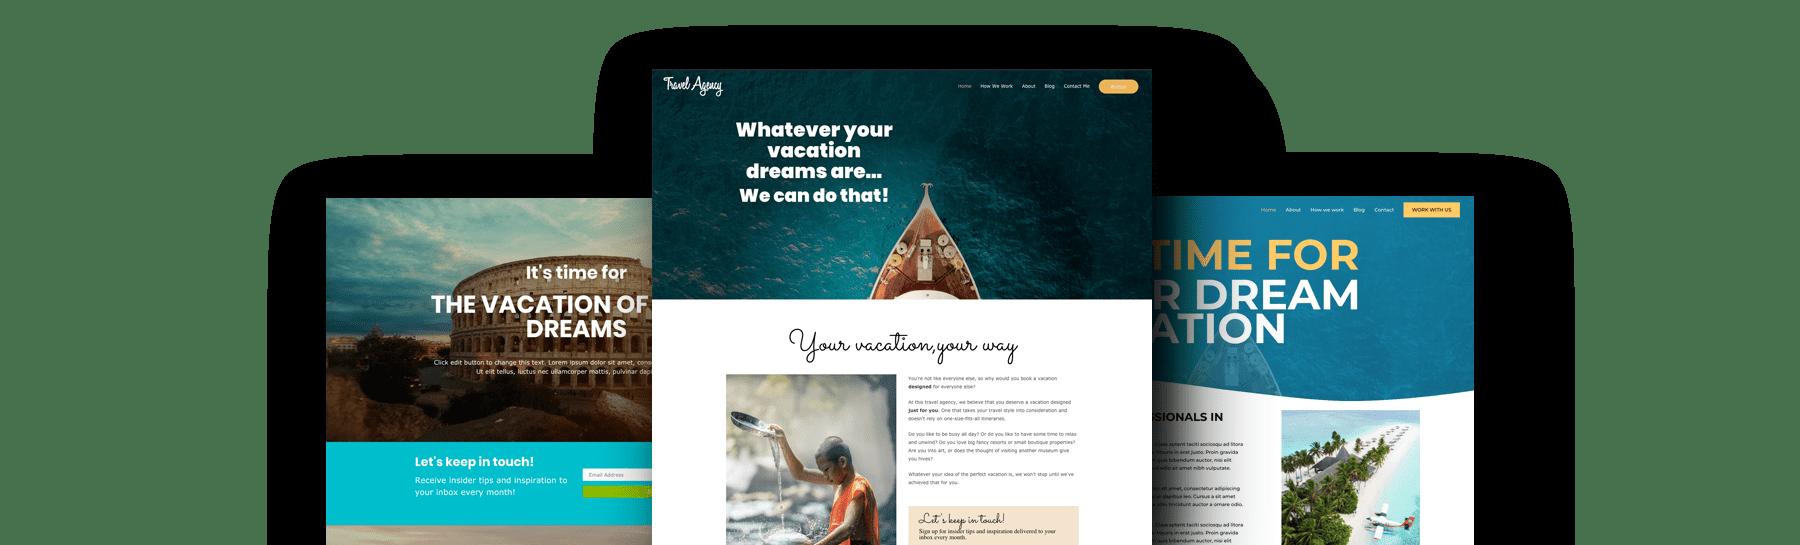 3-website-screenshots-header-image2